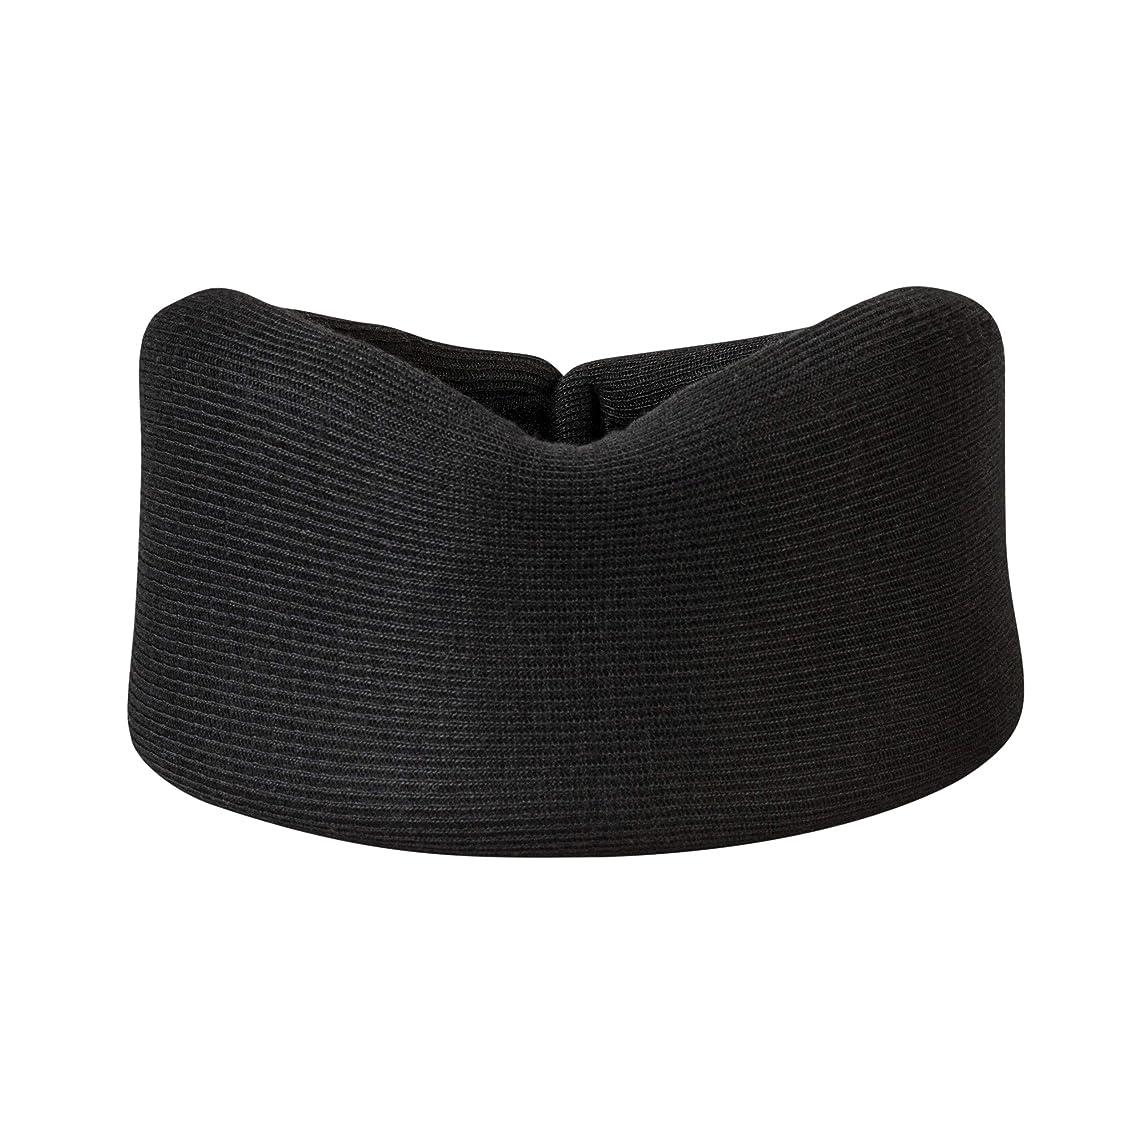 Core Products Foam Cervical Collar, Black - 3.5